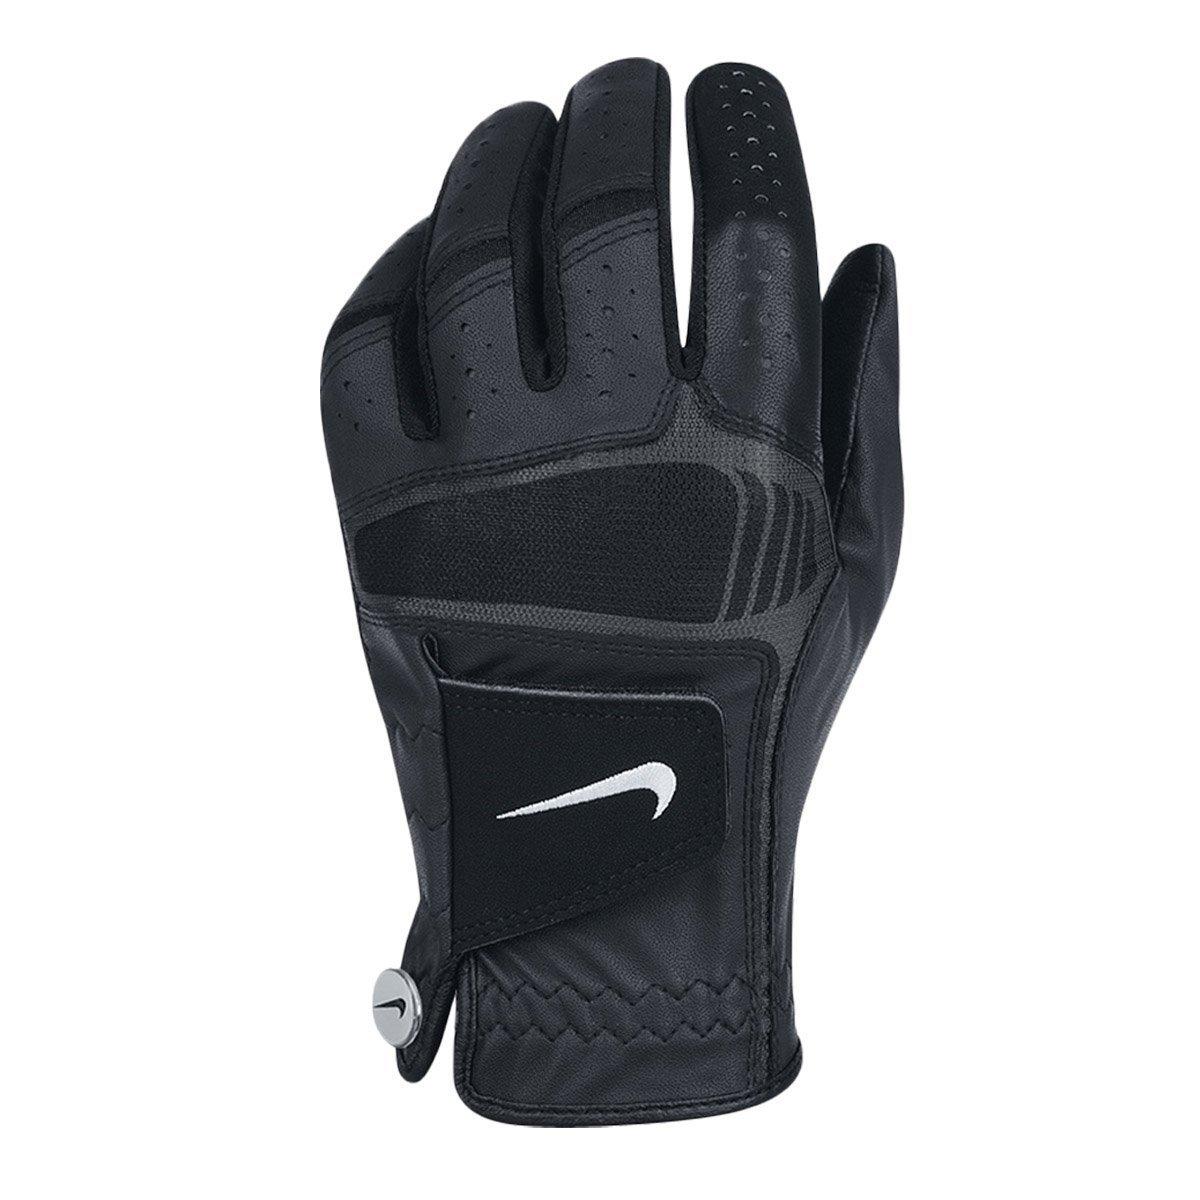 Mens nike leather gloves - Http D3d71ba2asa5oz Cloudfront Net 12015669 Images Nikeglvtechxtrbb Nike Tech Xtreme Iv Men S Golf Glove